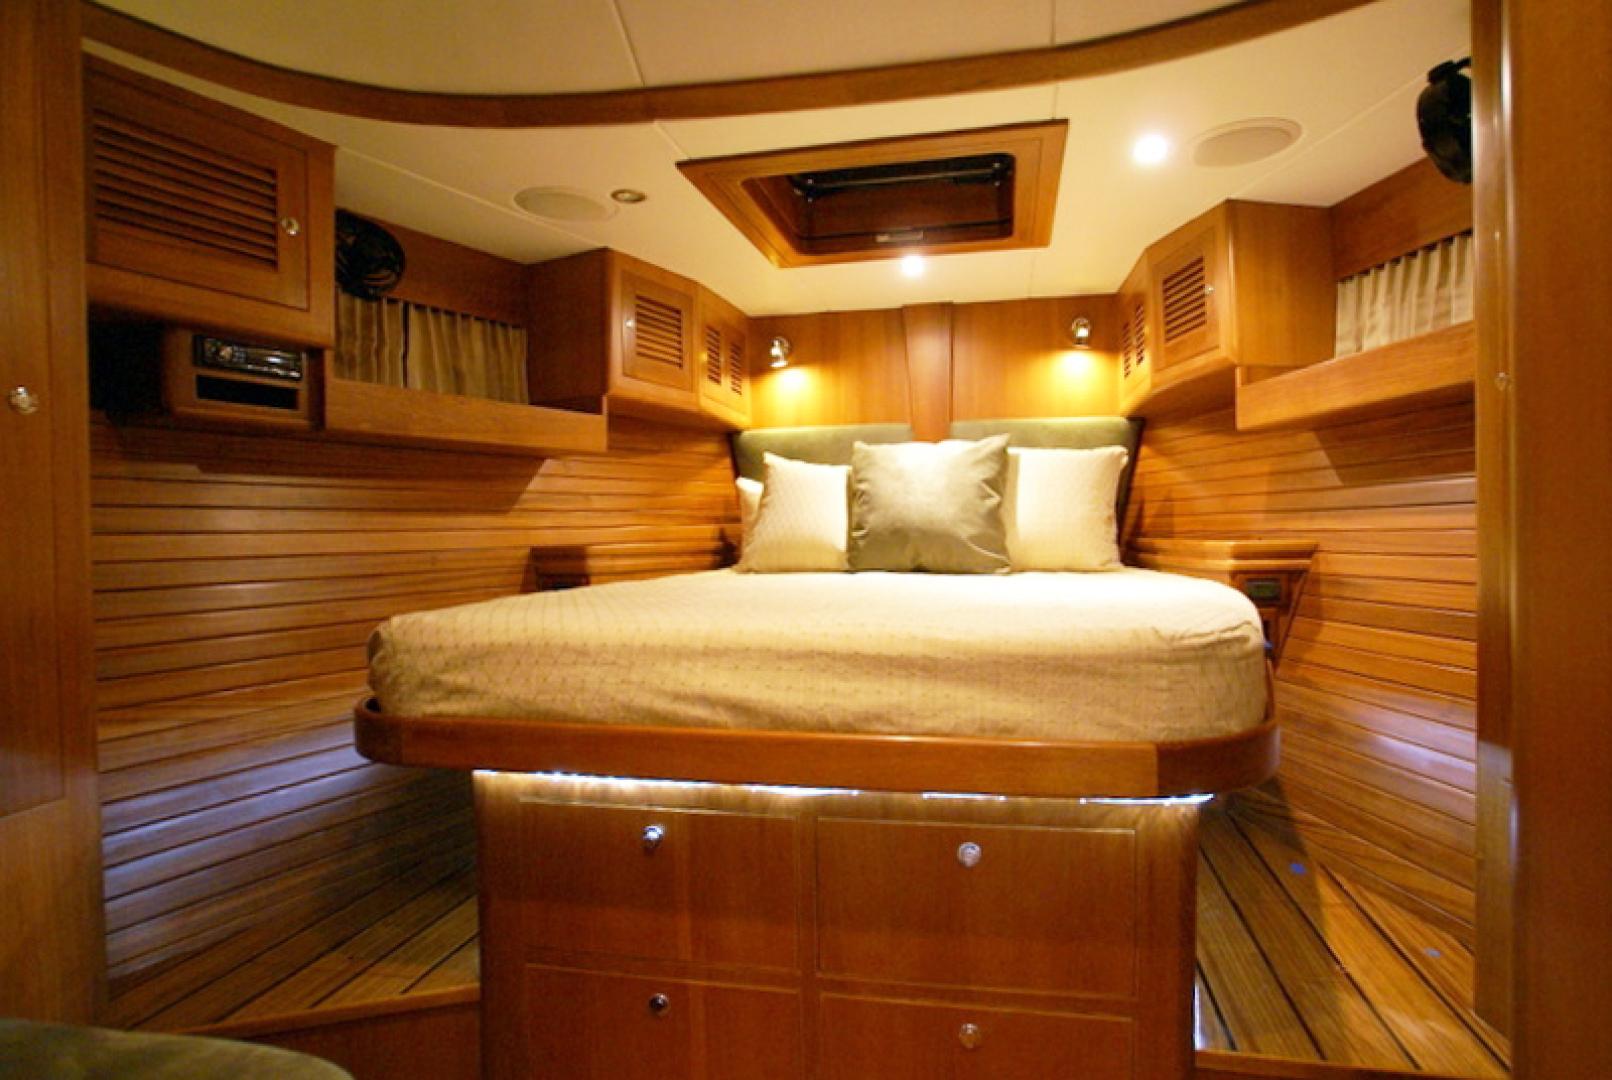 Hylas-70 Centerboard Cruiser 2007-AMANTE Barcelona-Spain-Fwd. Guest SR-1555643   Thumbnail